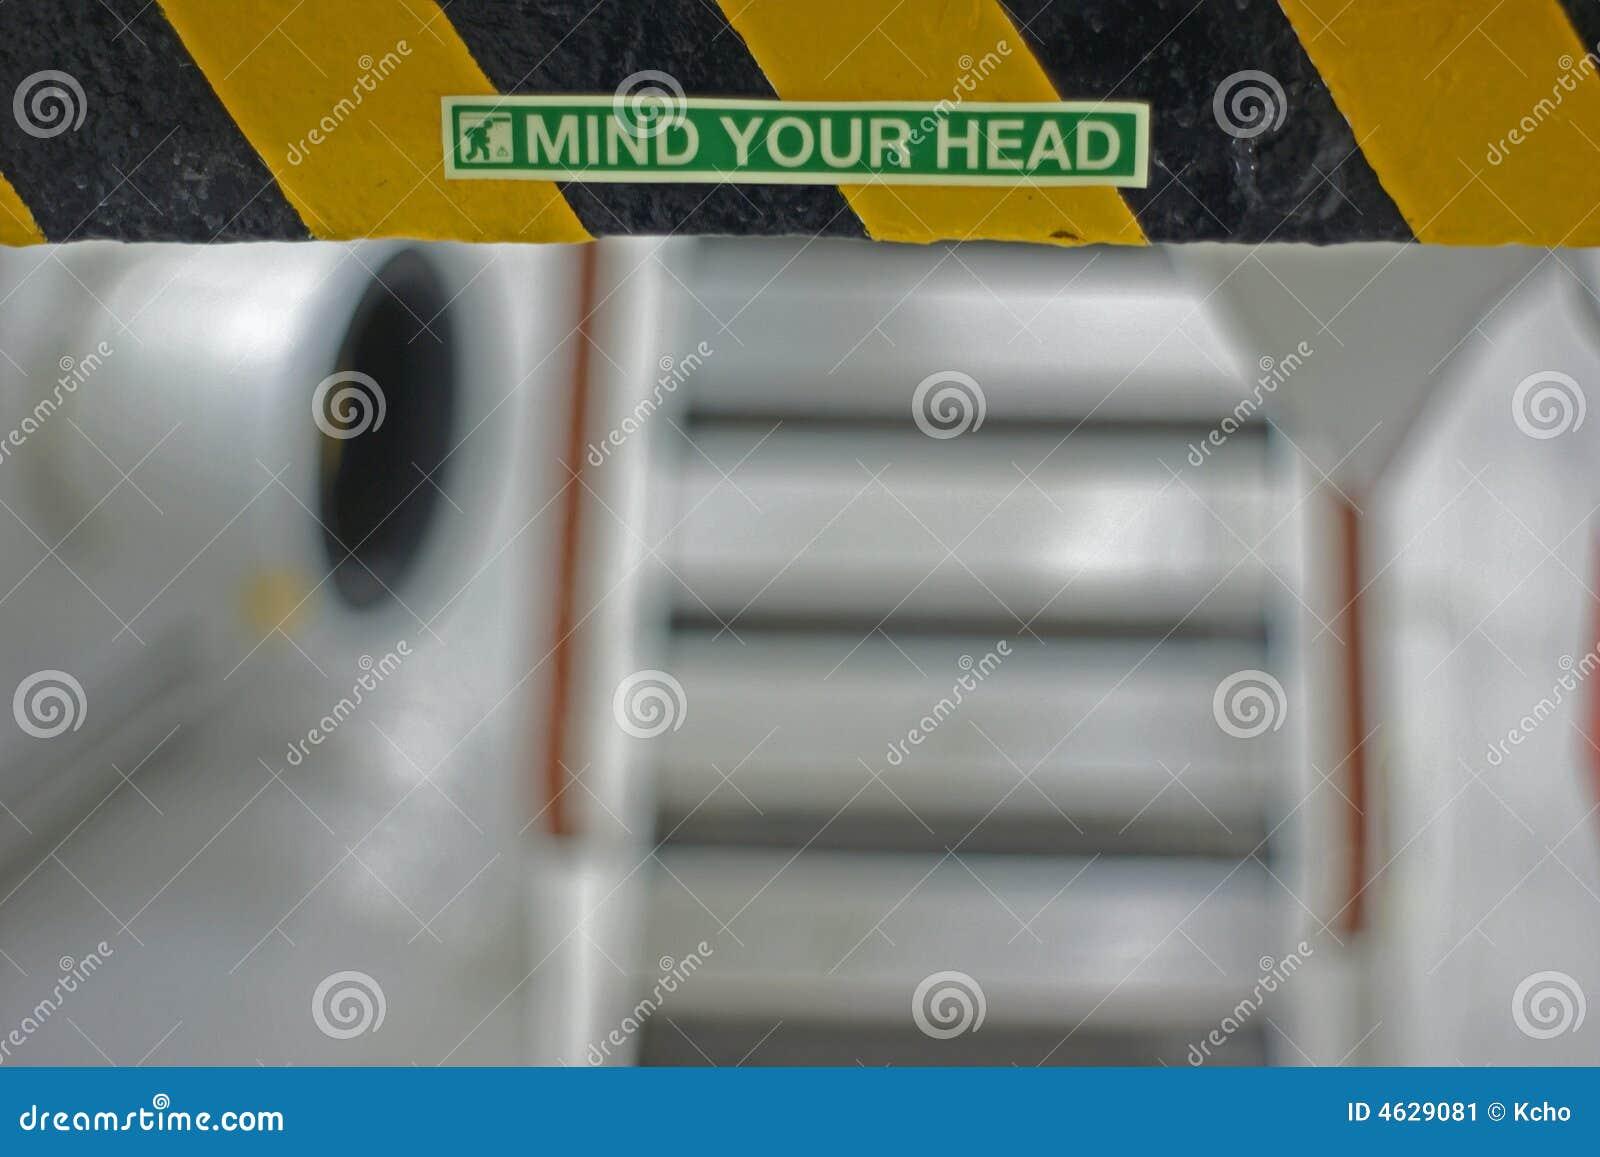 Ocupe-se de sua cabeça